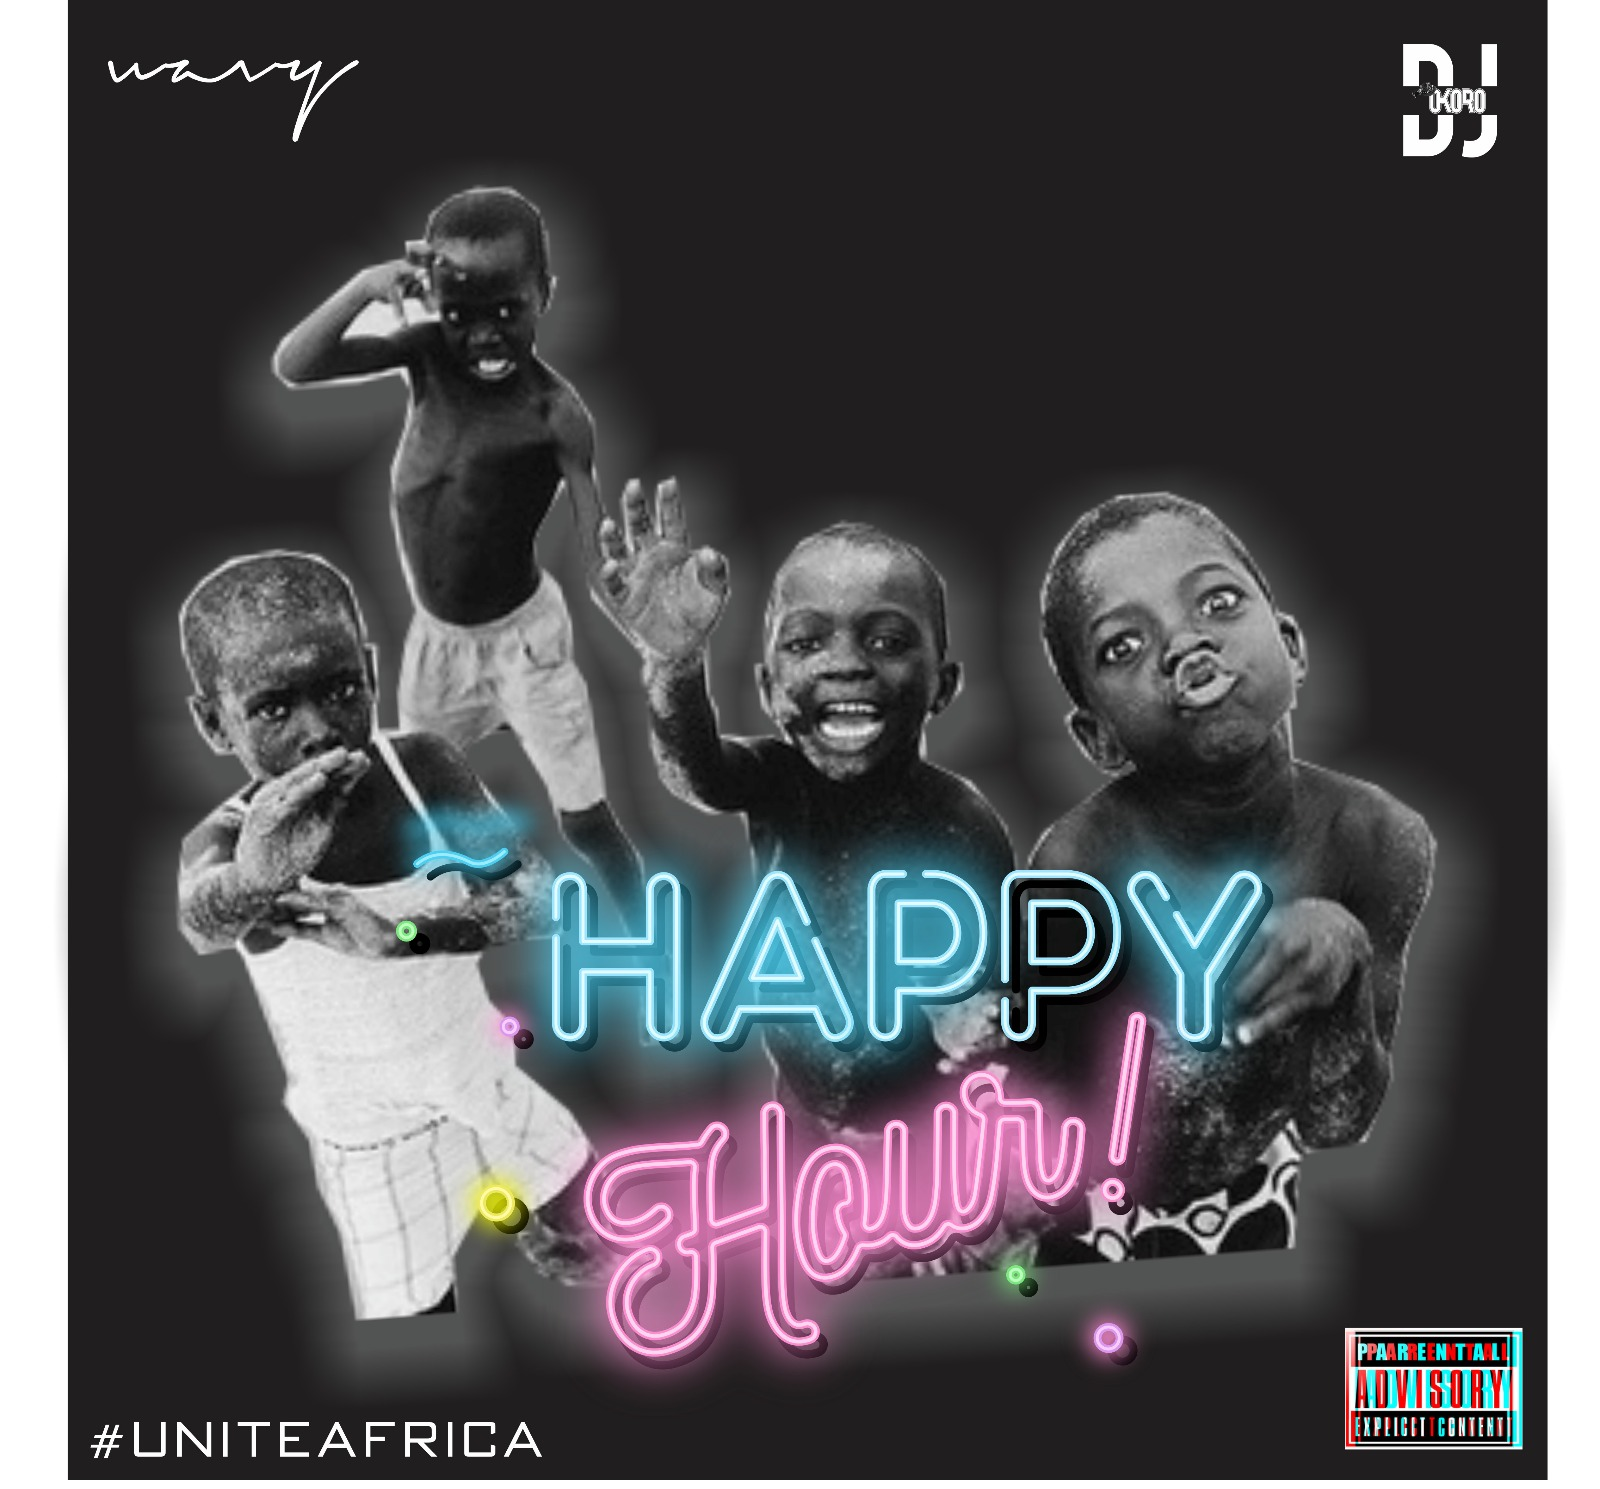 DJ Okoro - Happy Hour!